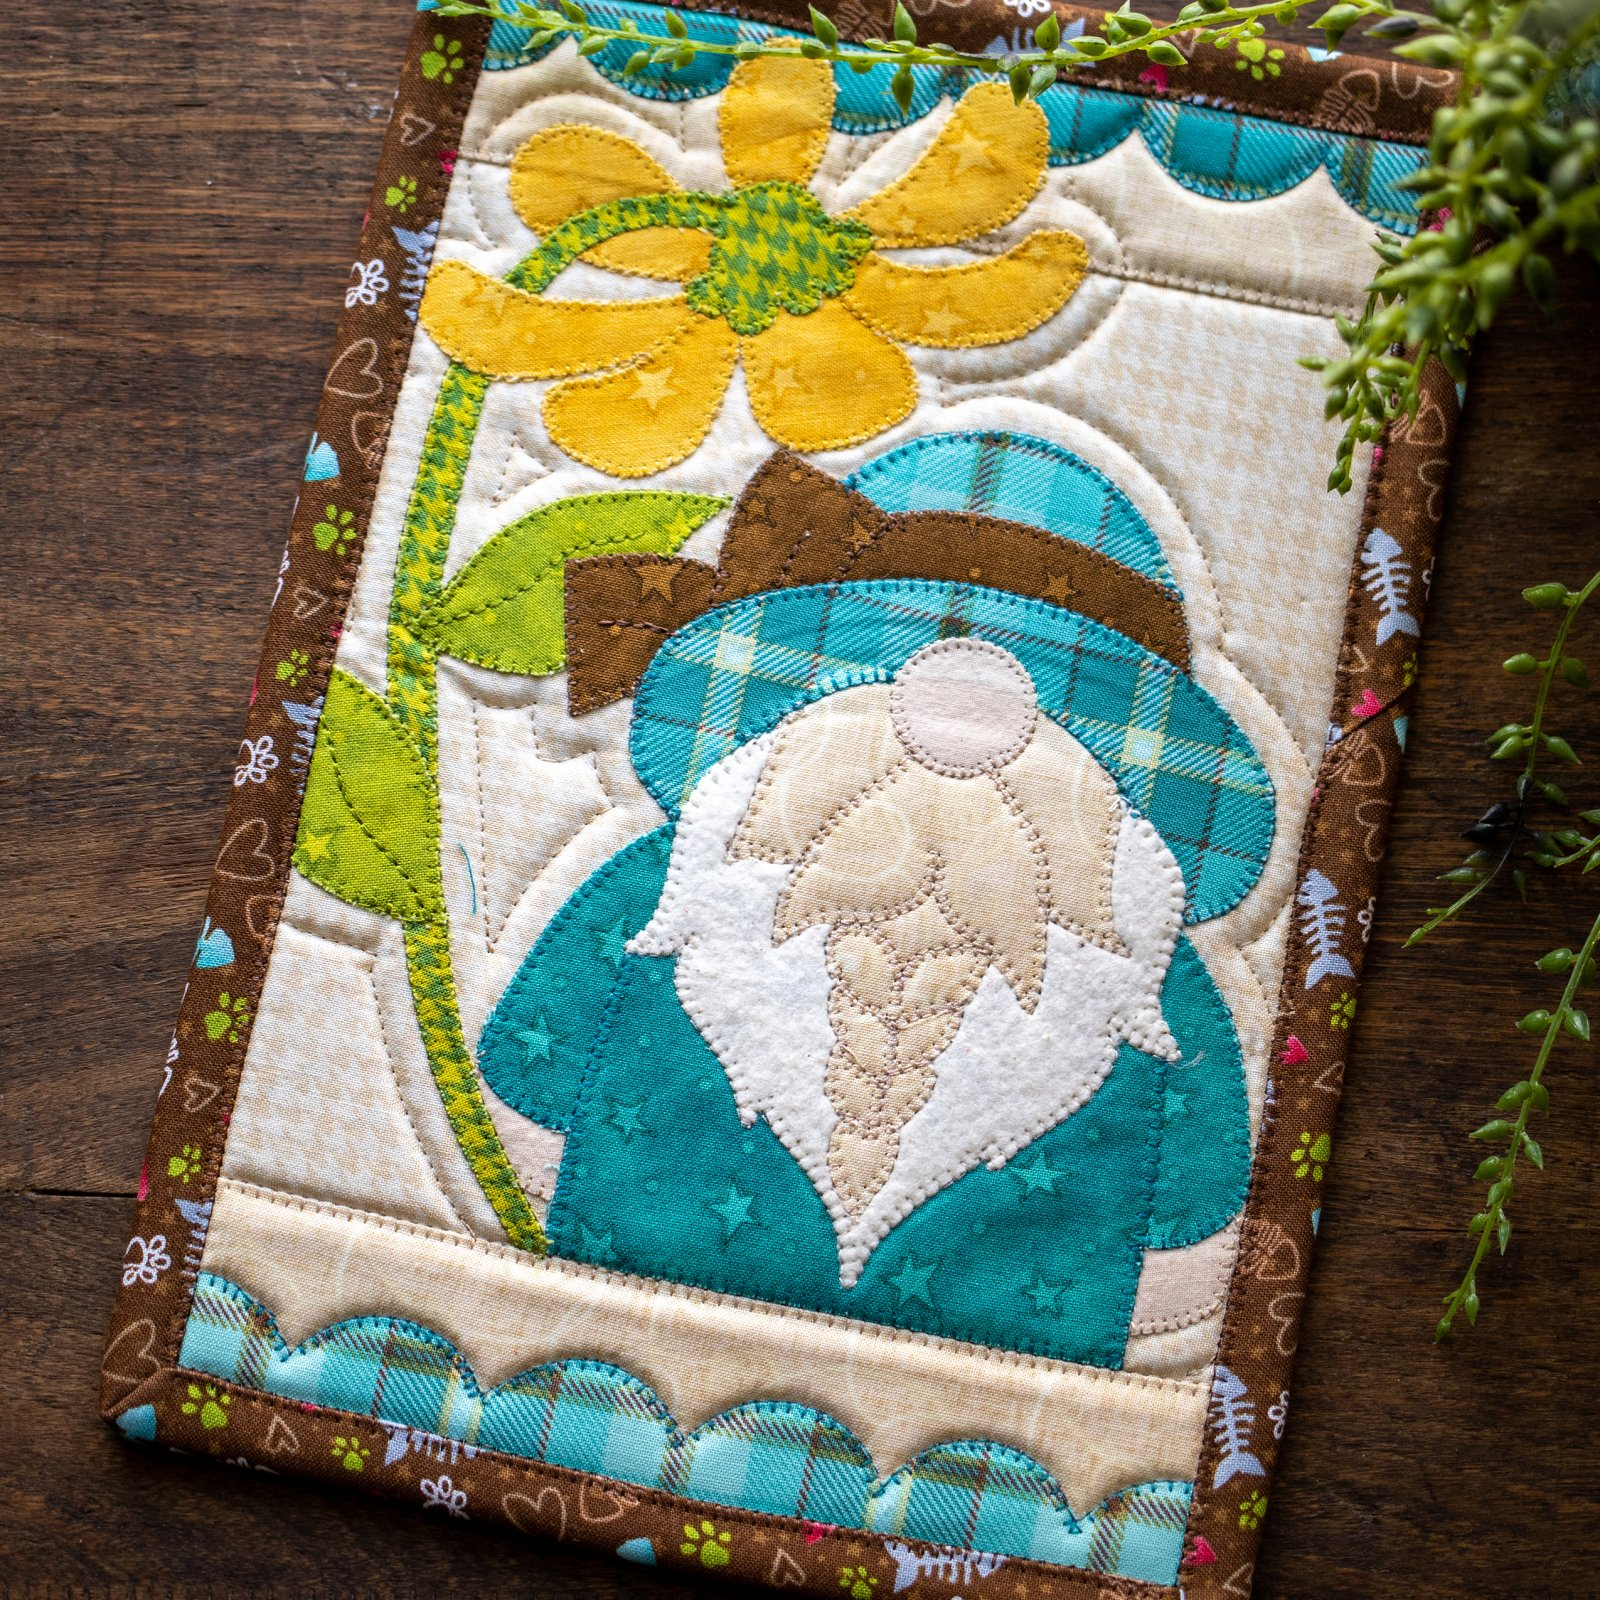 Spring Gnome Mug Rug Kit